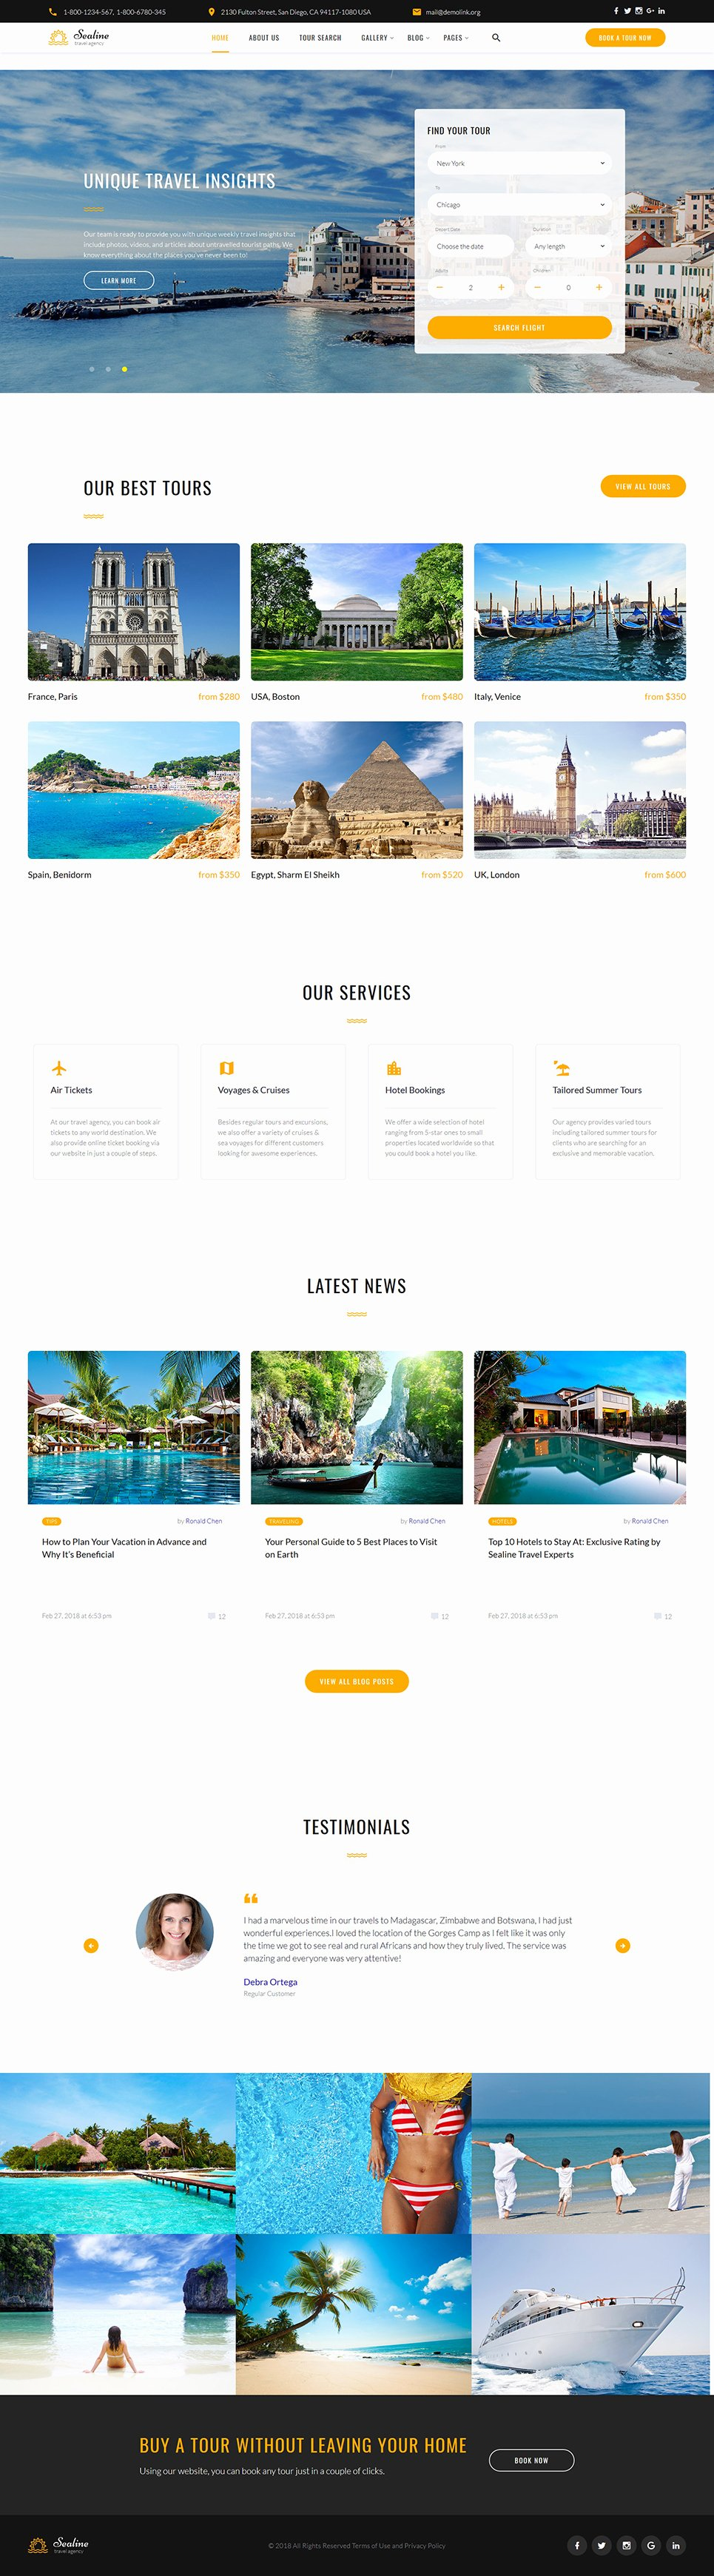 Travel Agent Website Template Fresh Travel Agency Responsive Website Template